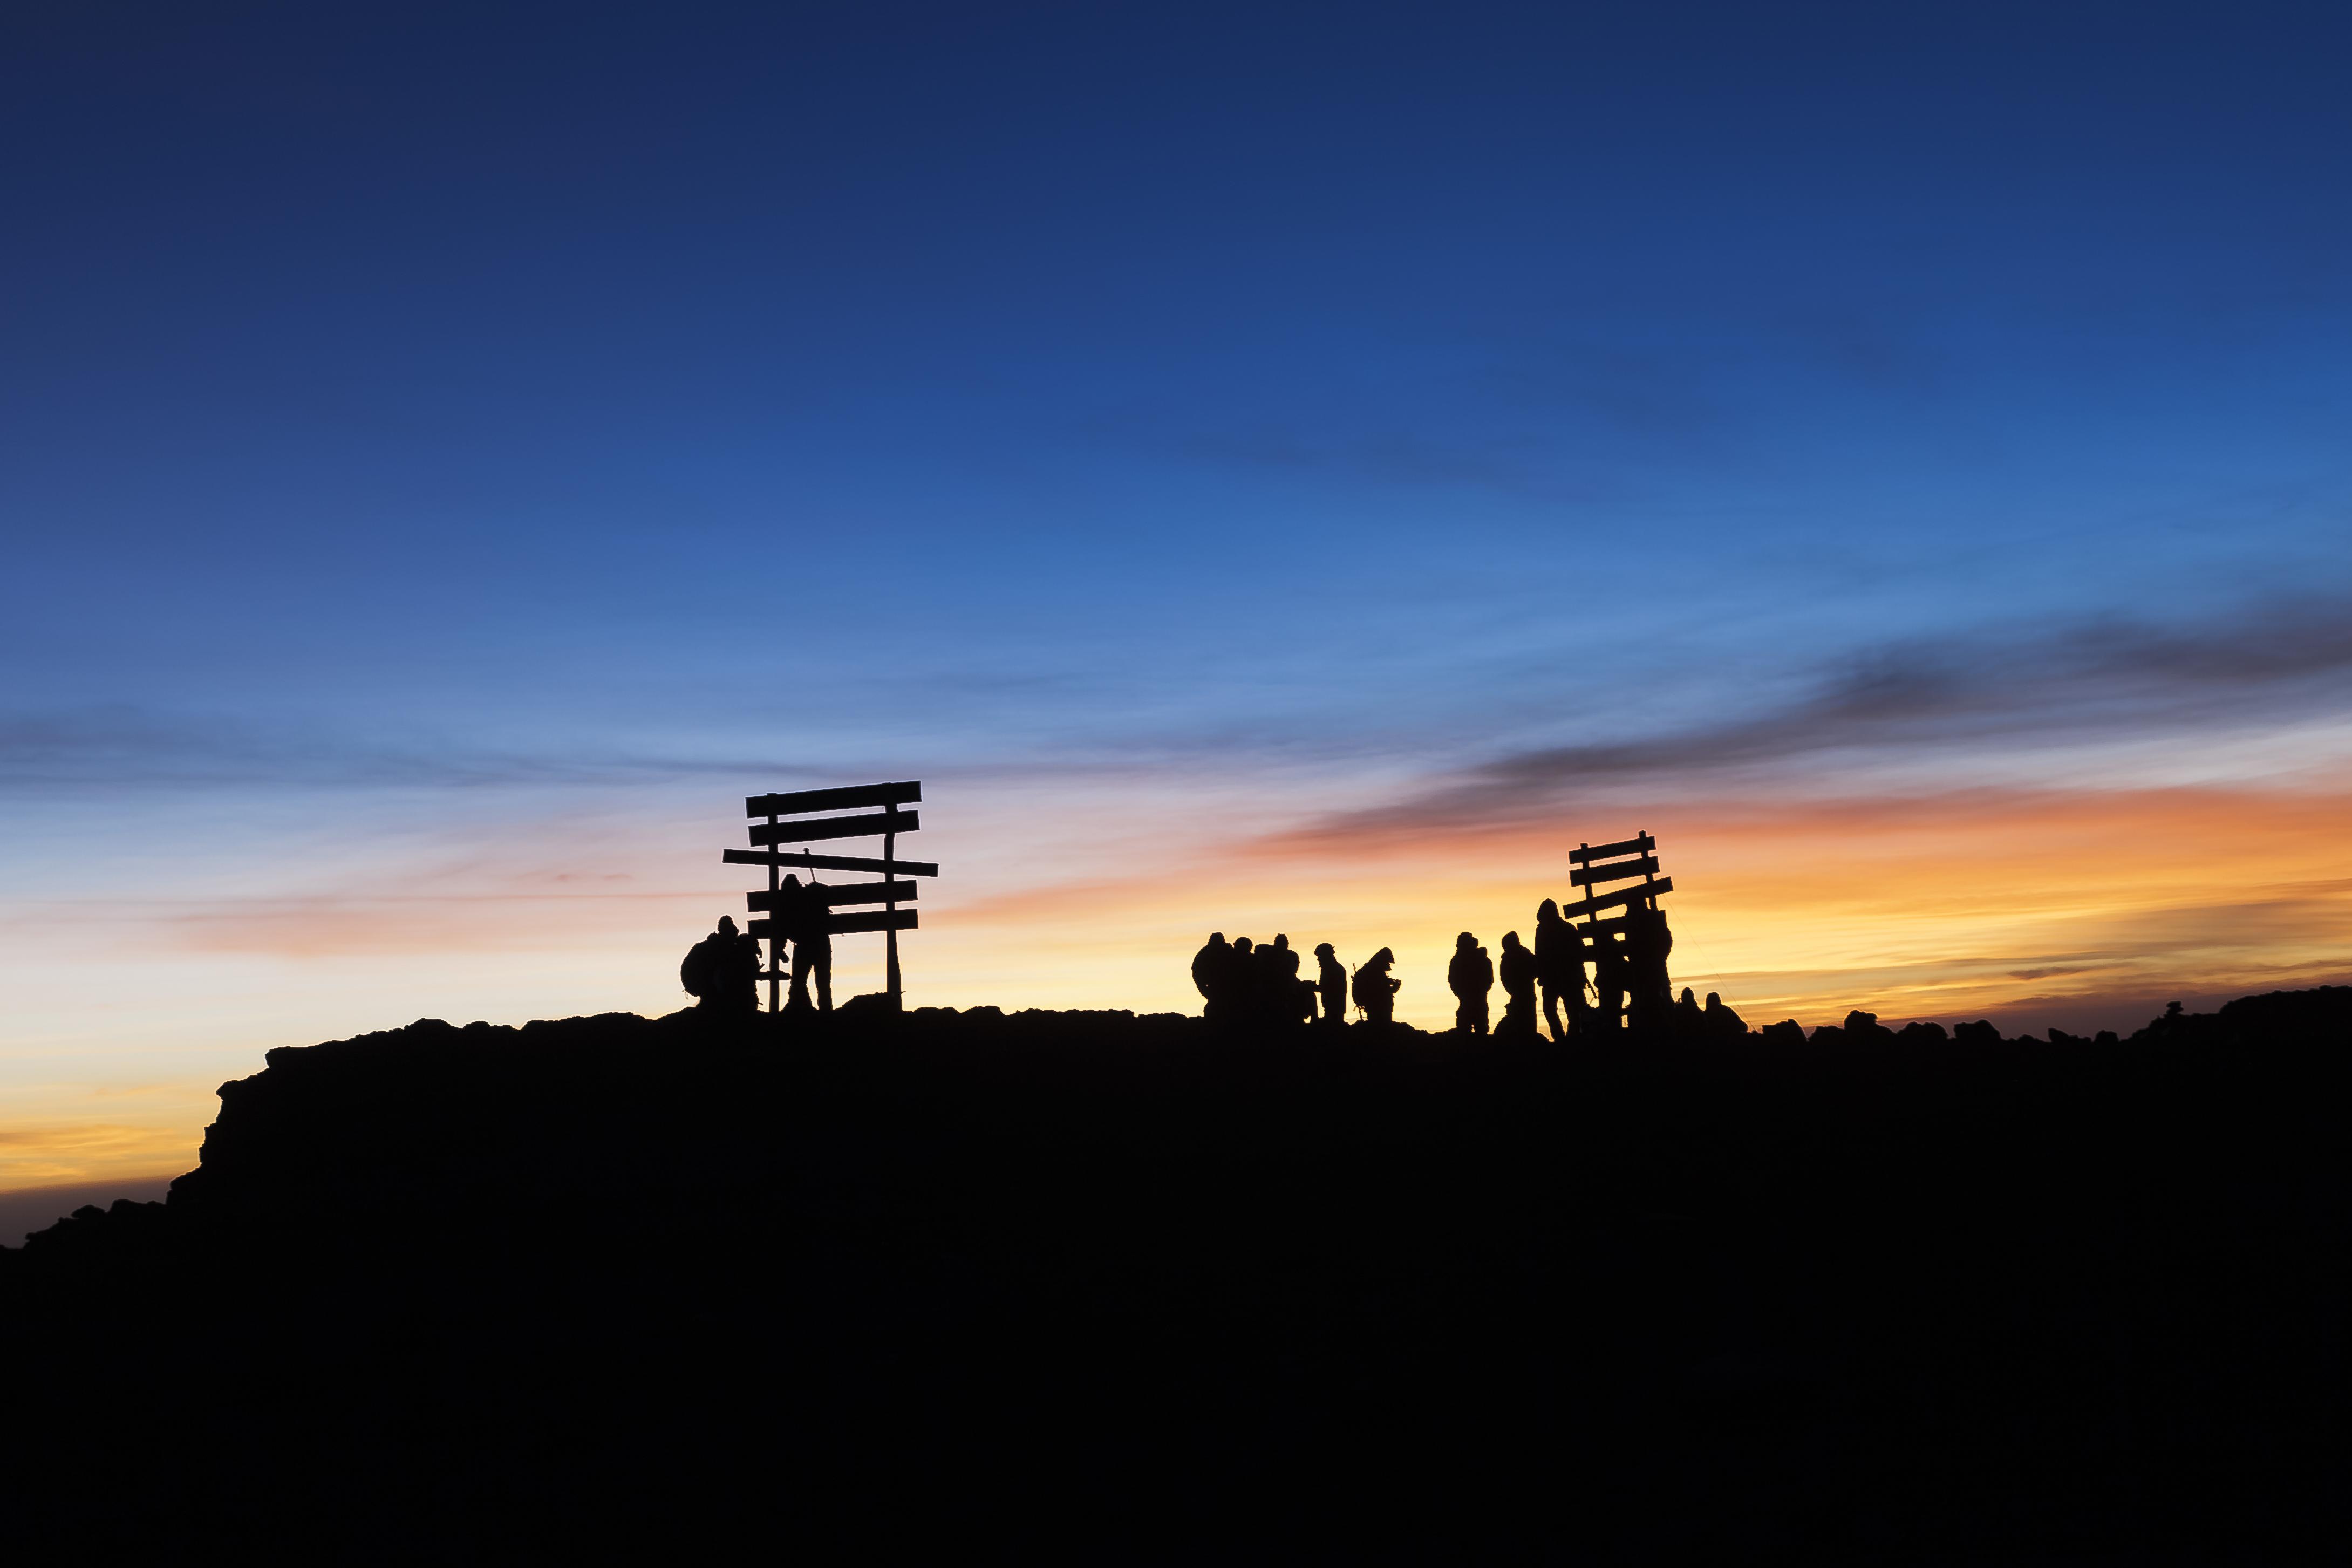 Sunrise at the summit of Mt. Kilimanjaro